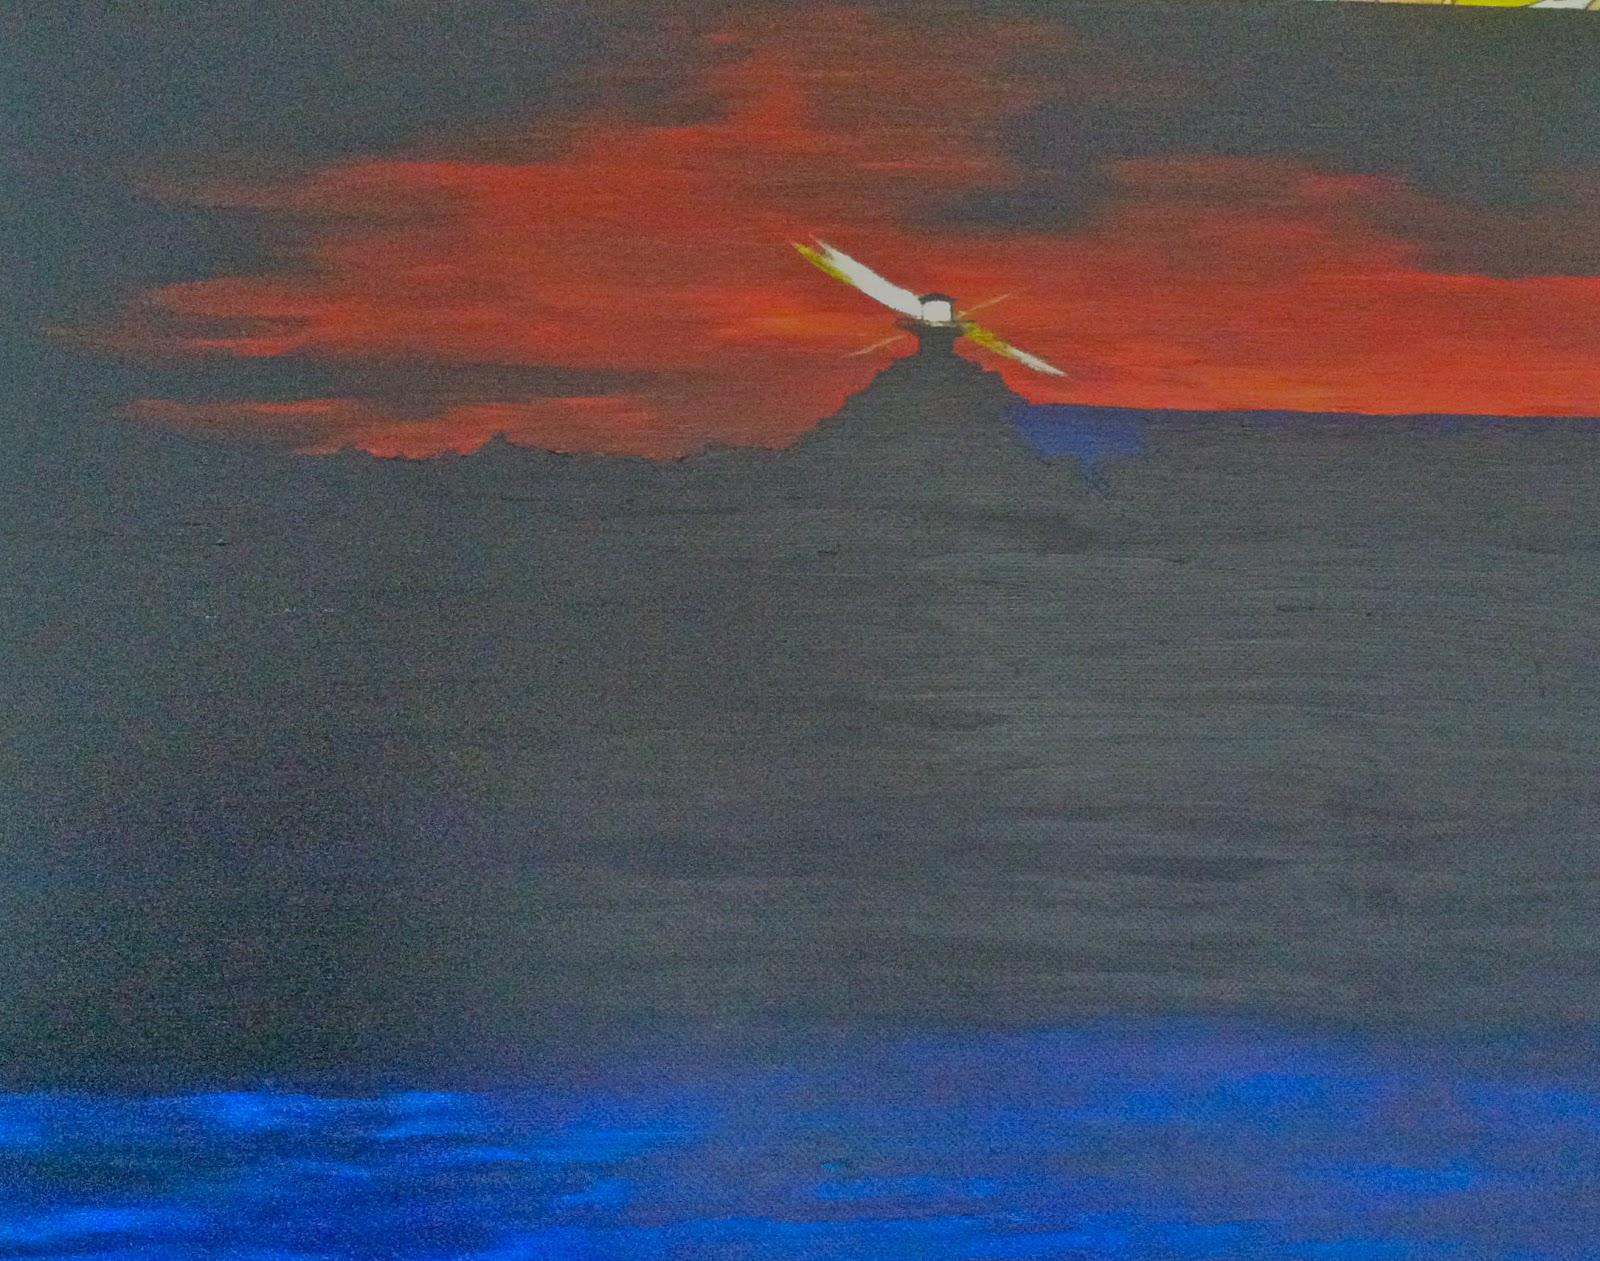 Lacrimosa - Untitled